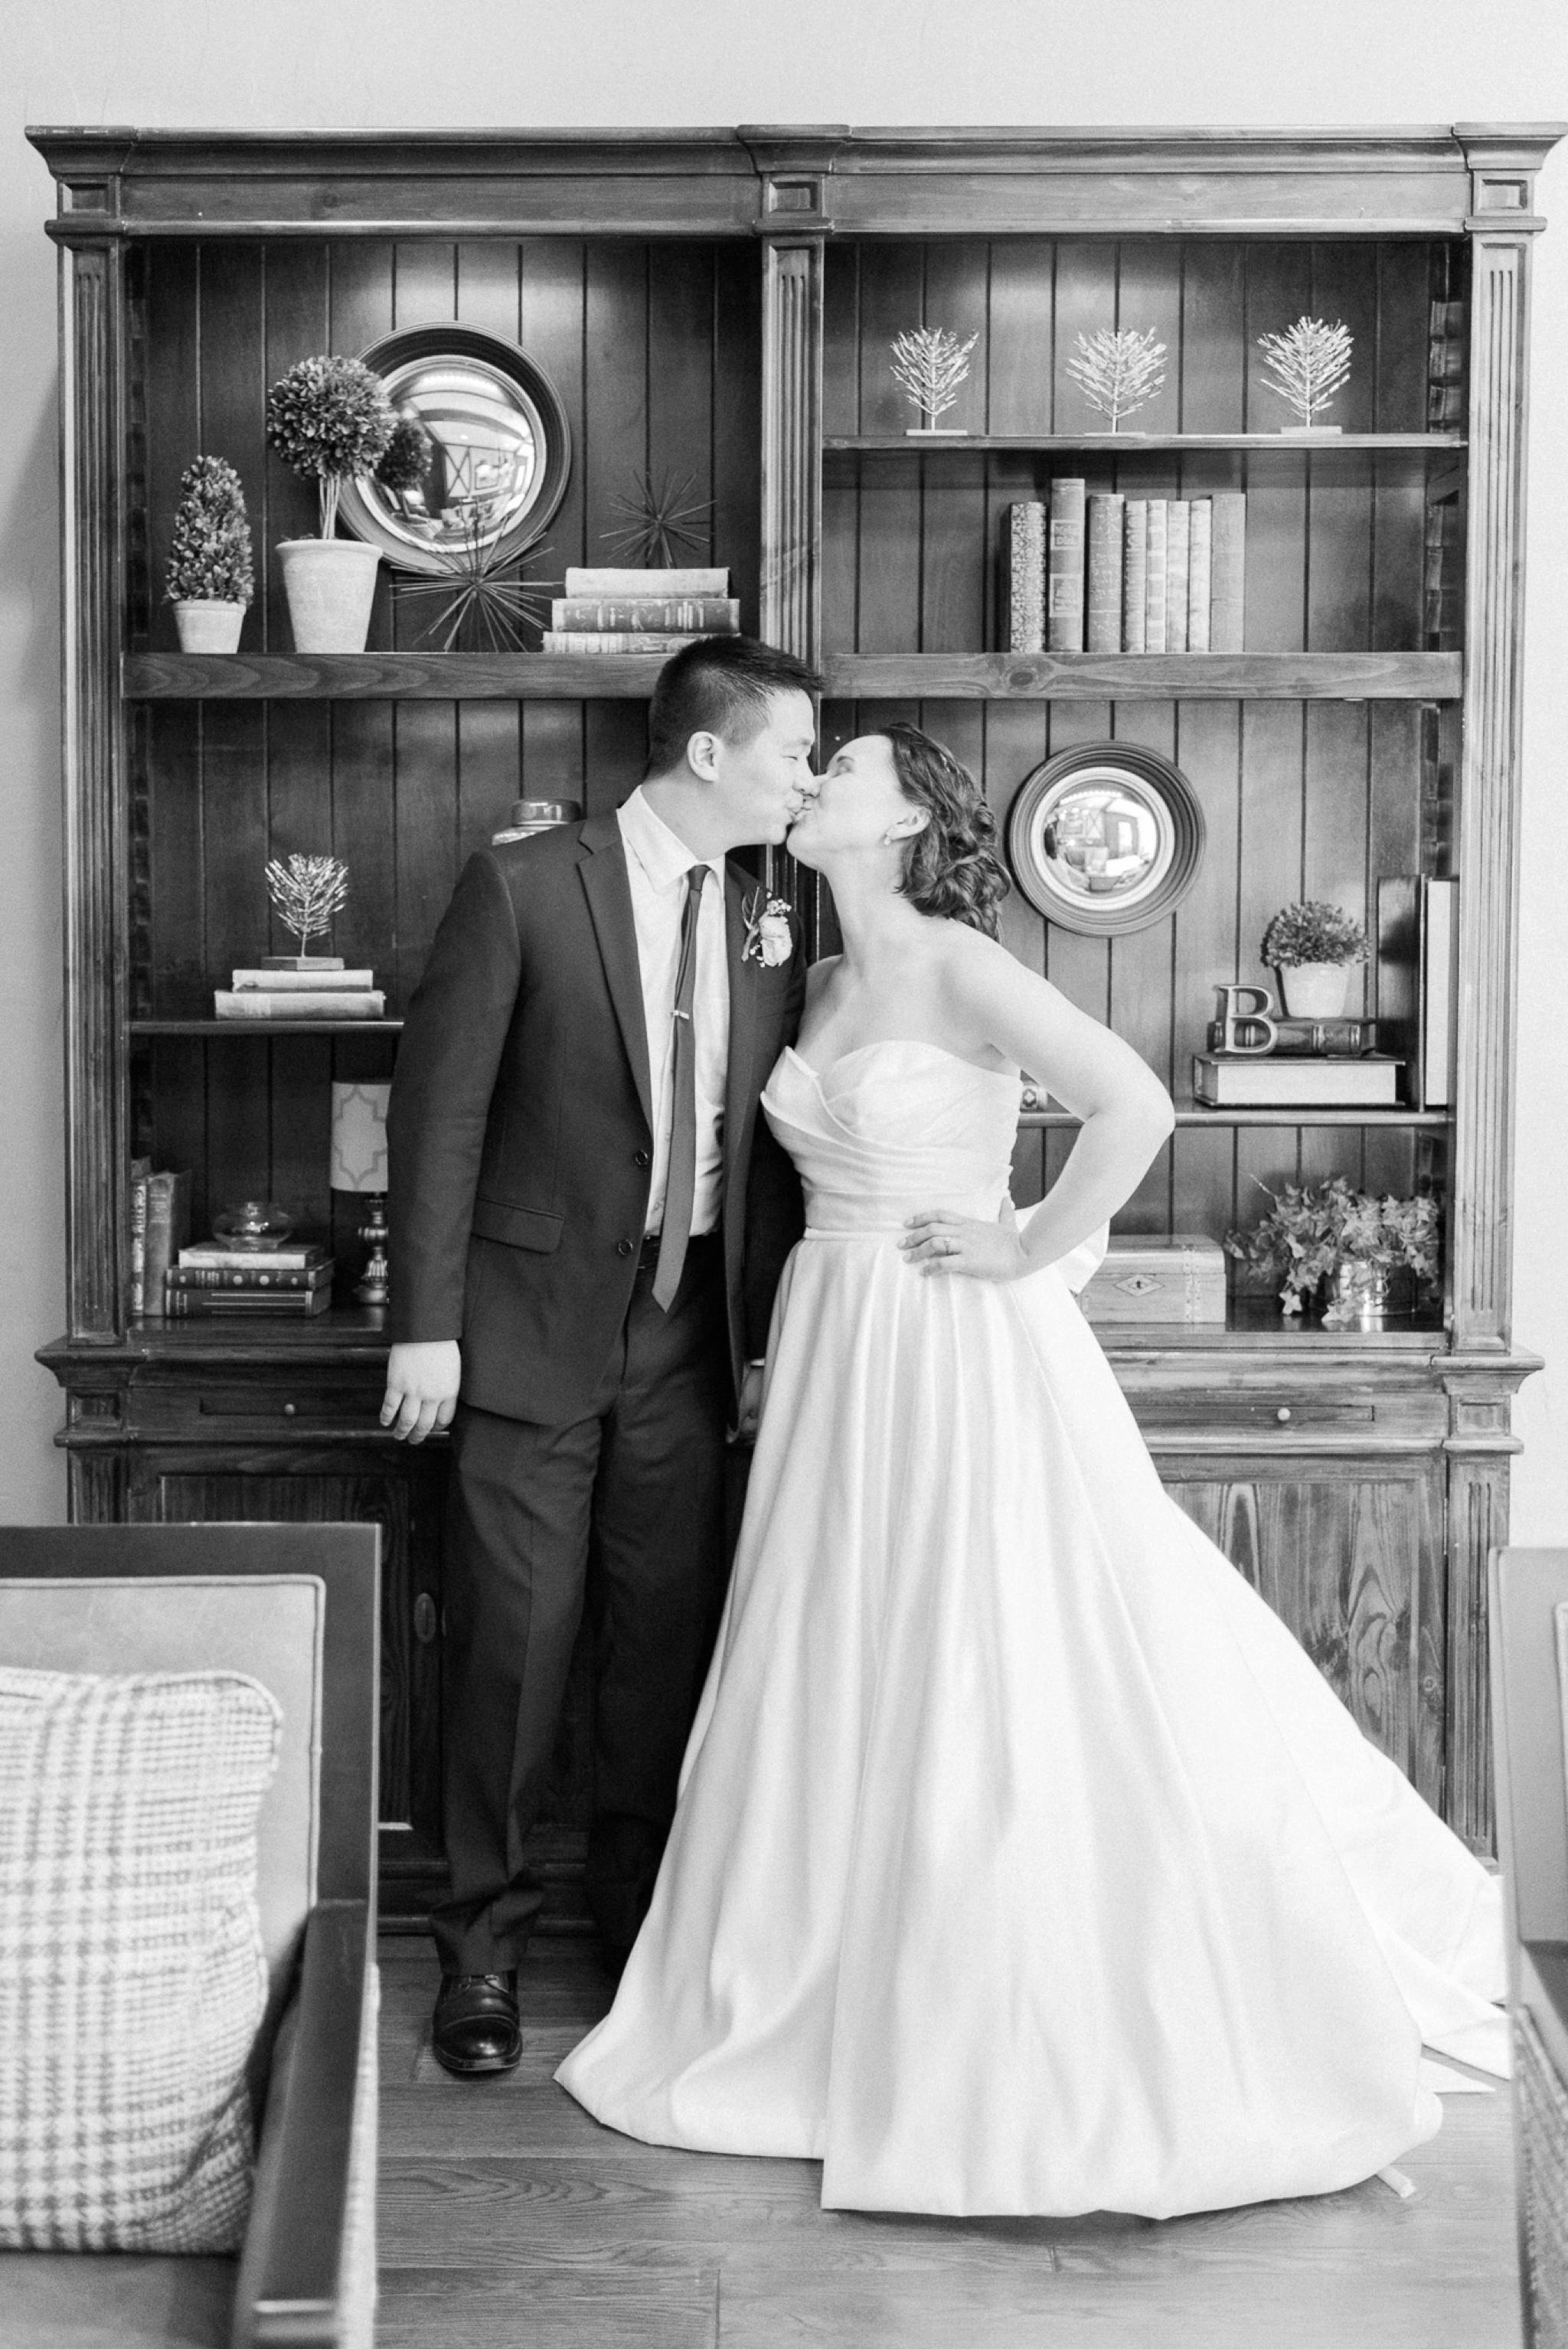 brookside-golf-country-club-wedding-columbus-ohio-160.jpg